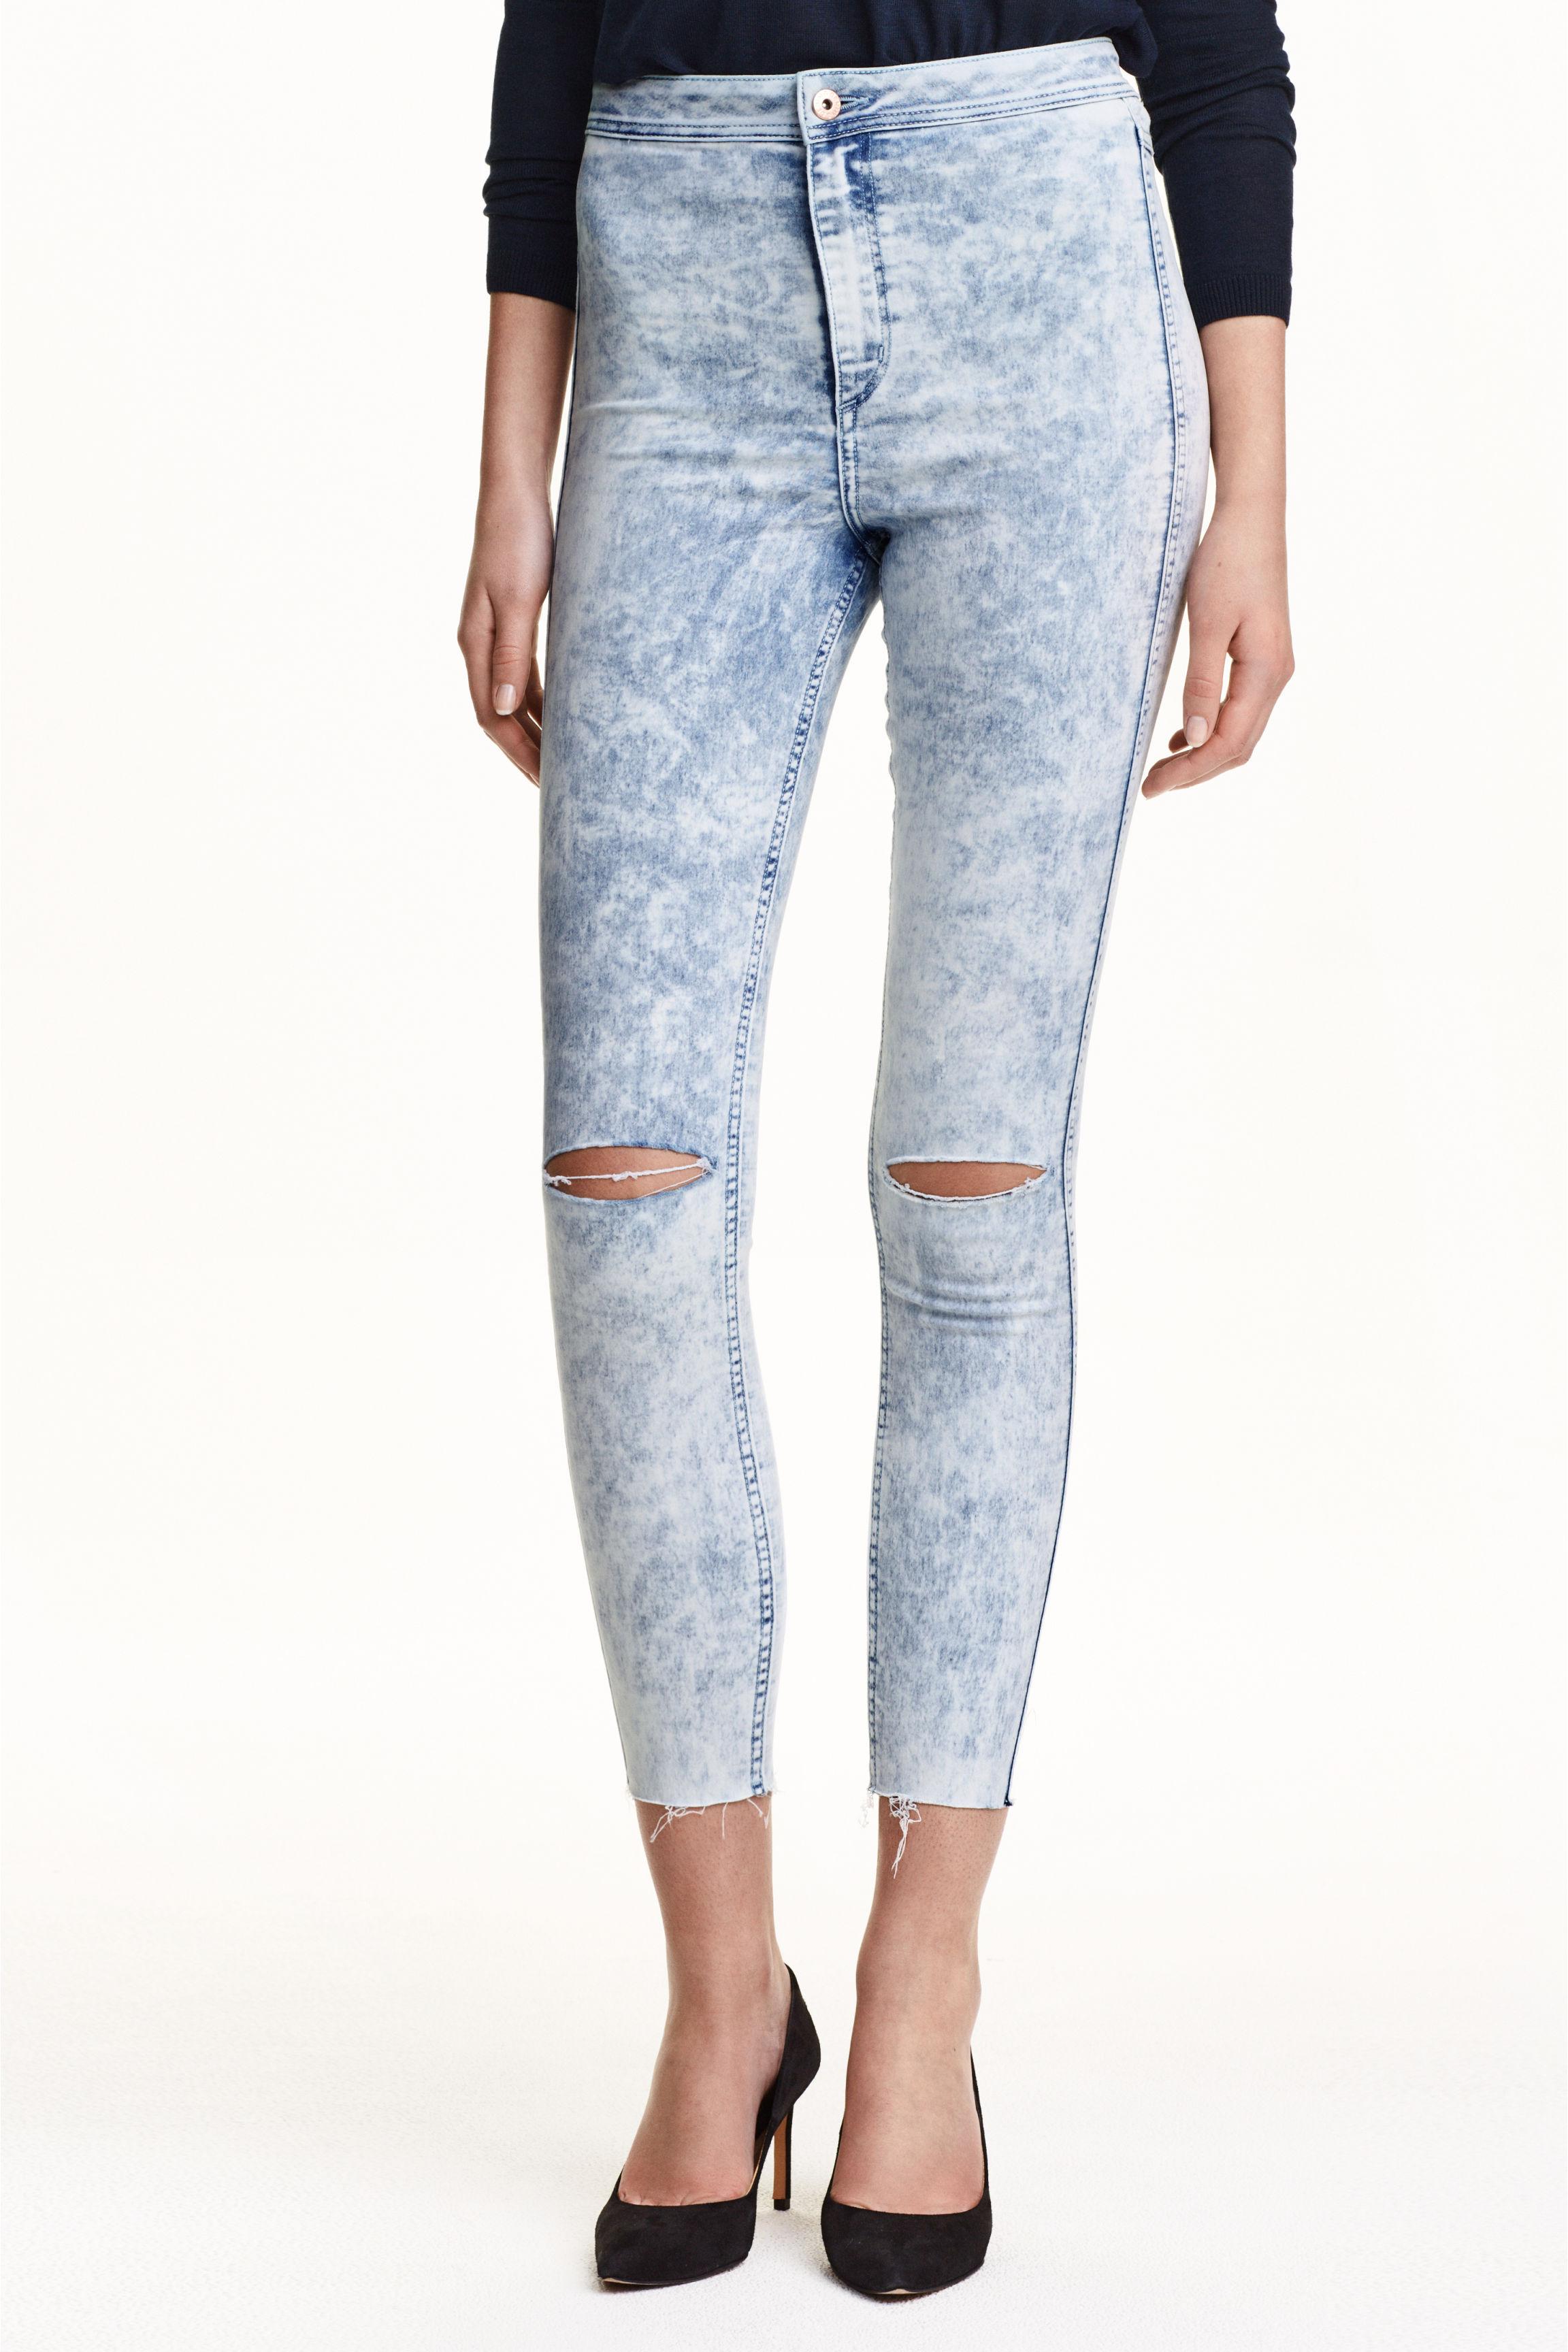 Skinny High Ankle Ripped Jeans - Black - Ladies | H&ampM GB